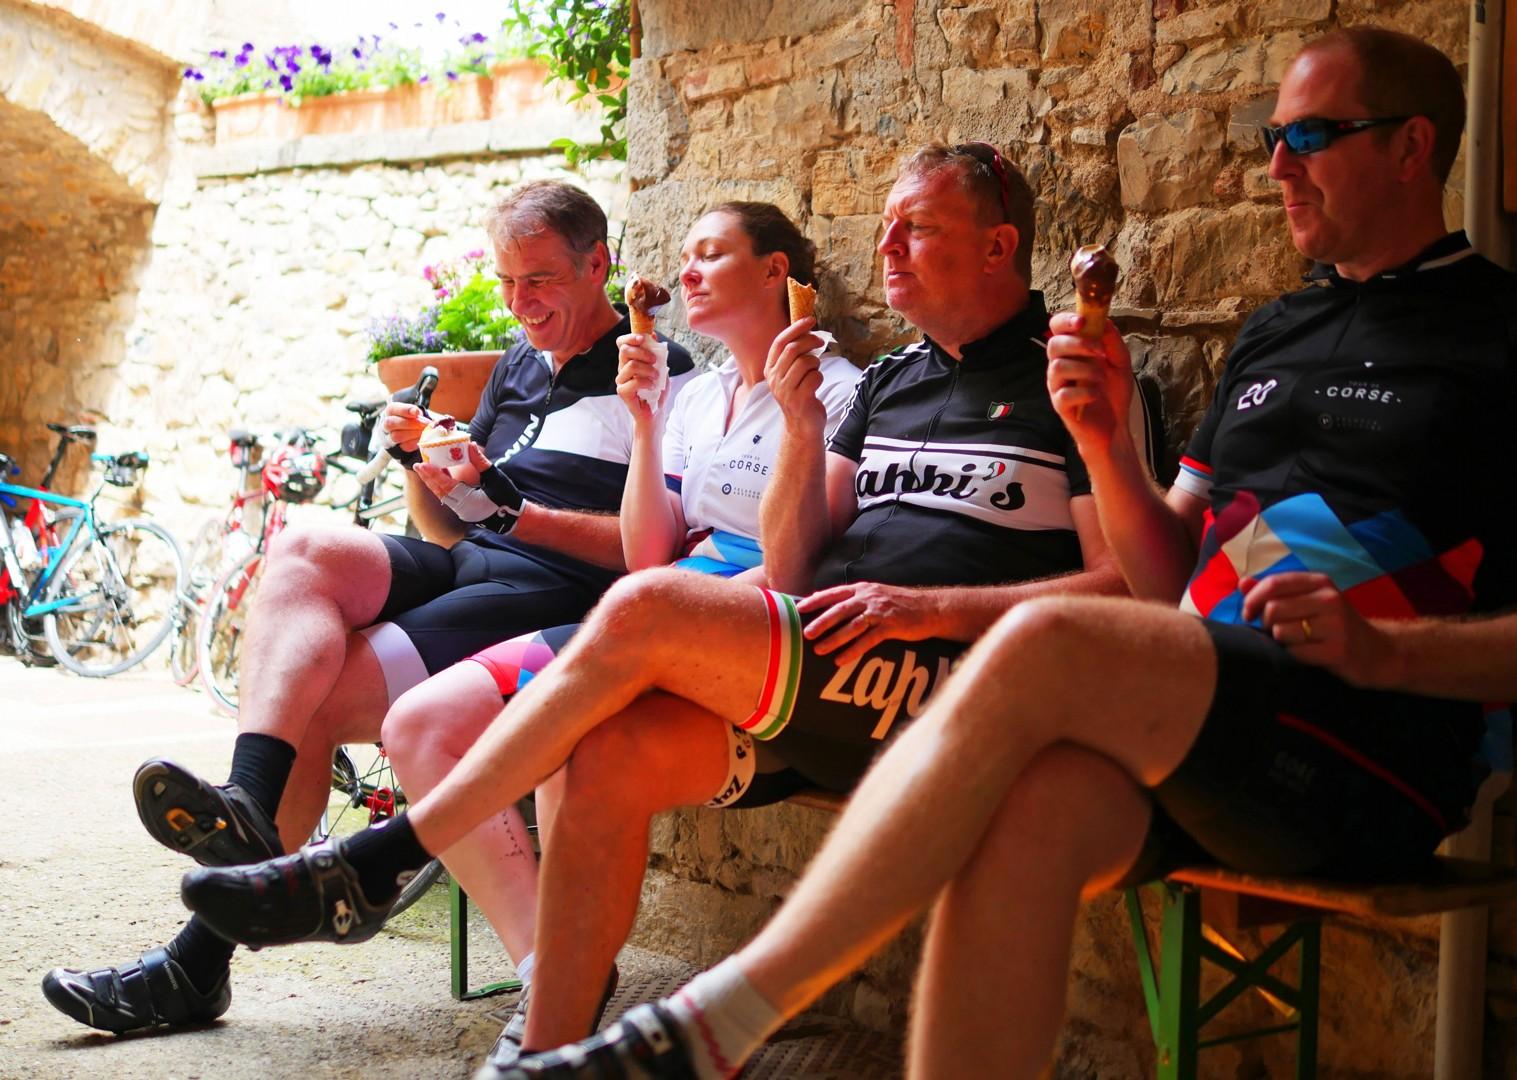 team-gelato-italy-tuscany-cycling-holiday.jpg - Italy - Tuscany Tourer - Self Guided Road Cycling Holiday - Road Cycling